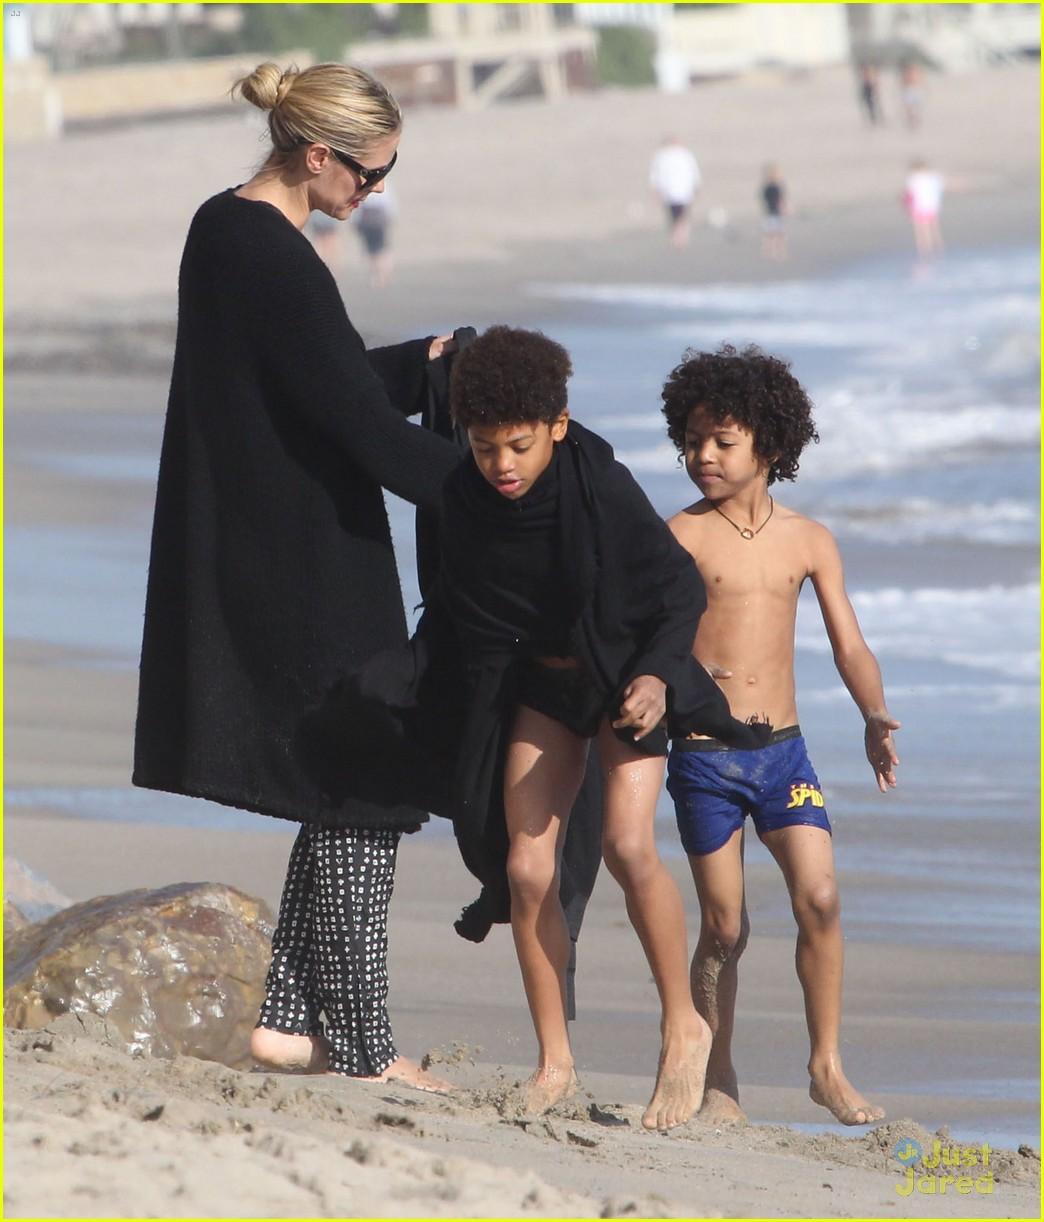 heidi klum martin kirsten beach day with the kids 272814917